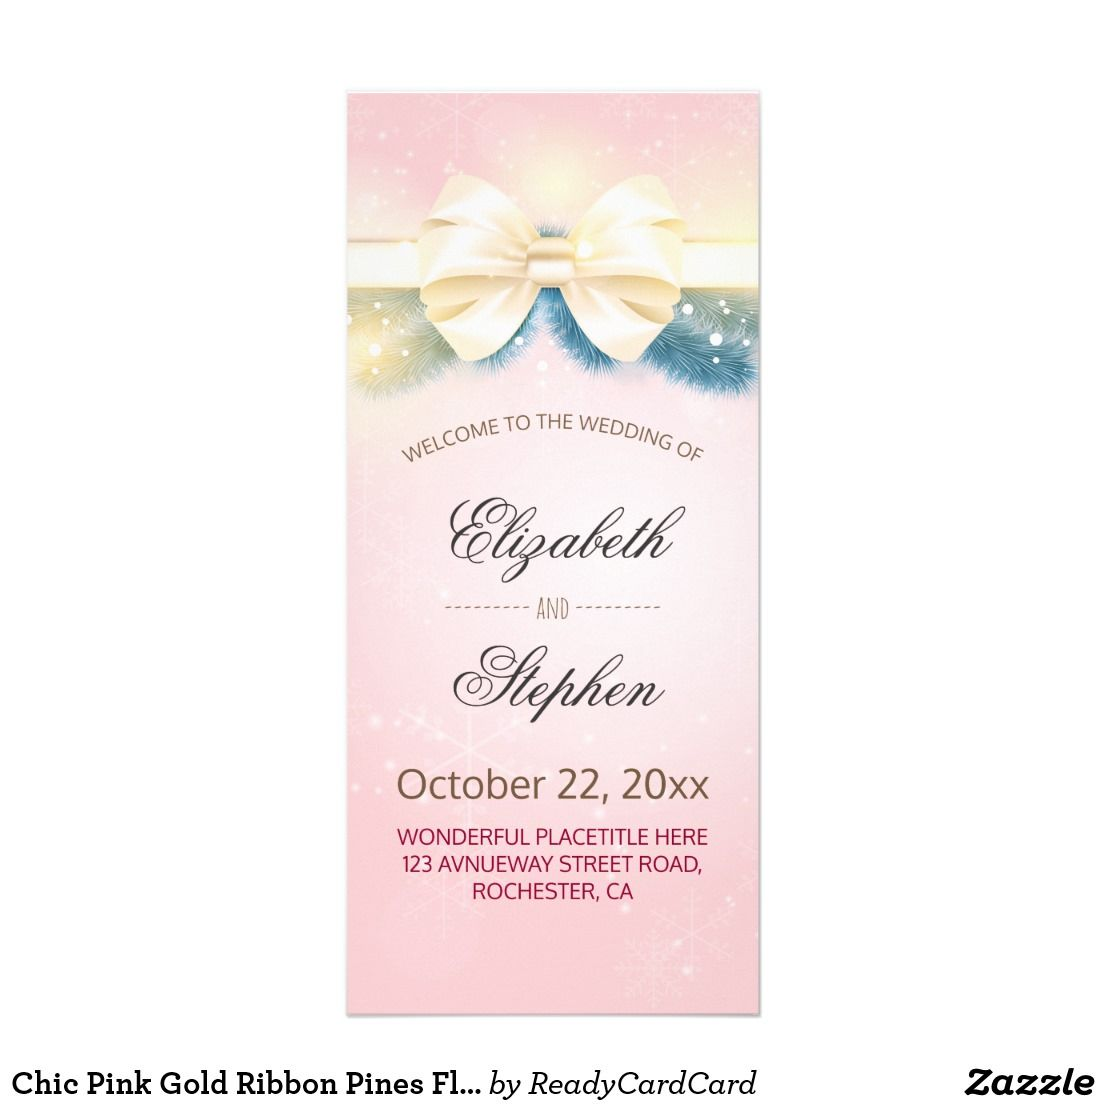 Chic Pink Gold Ribbon Pines Fl Wedding Program Elegant Vintage Modern And